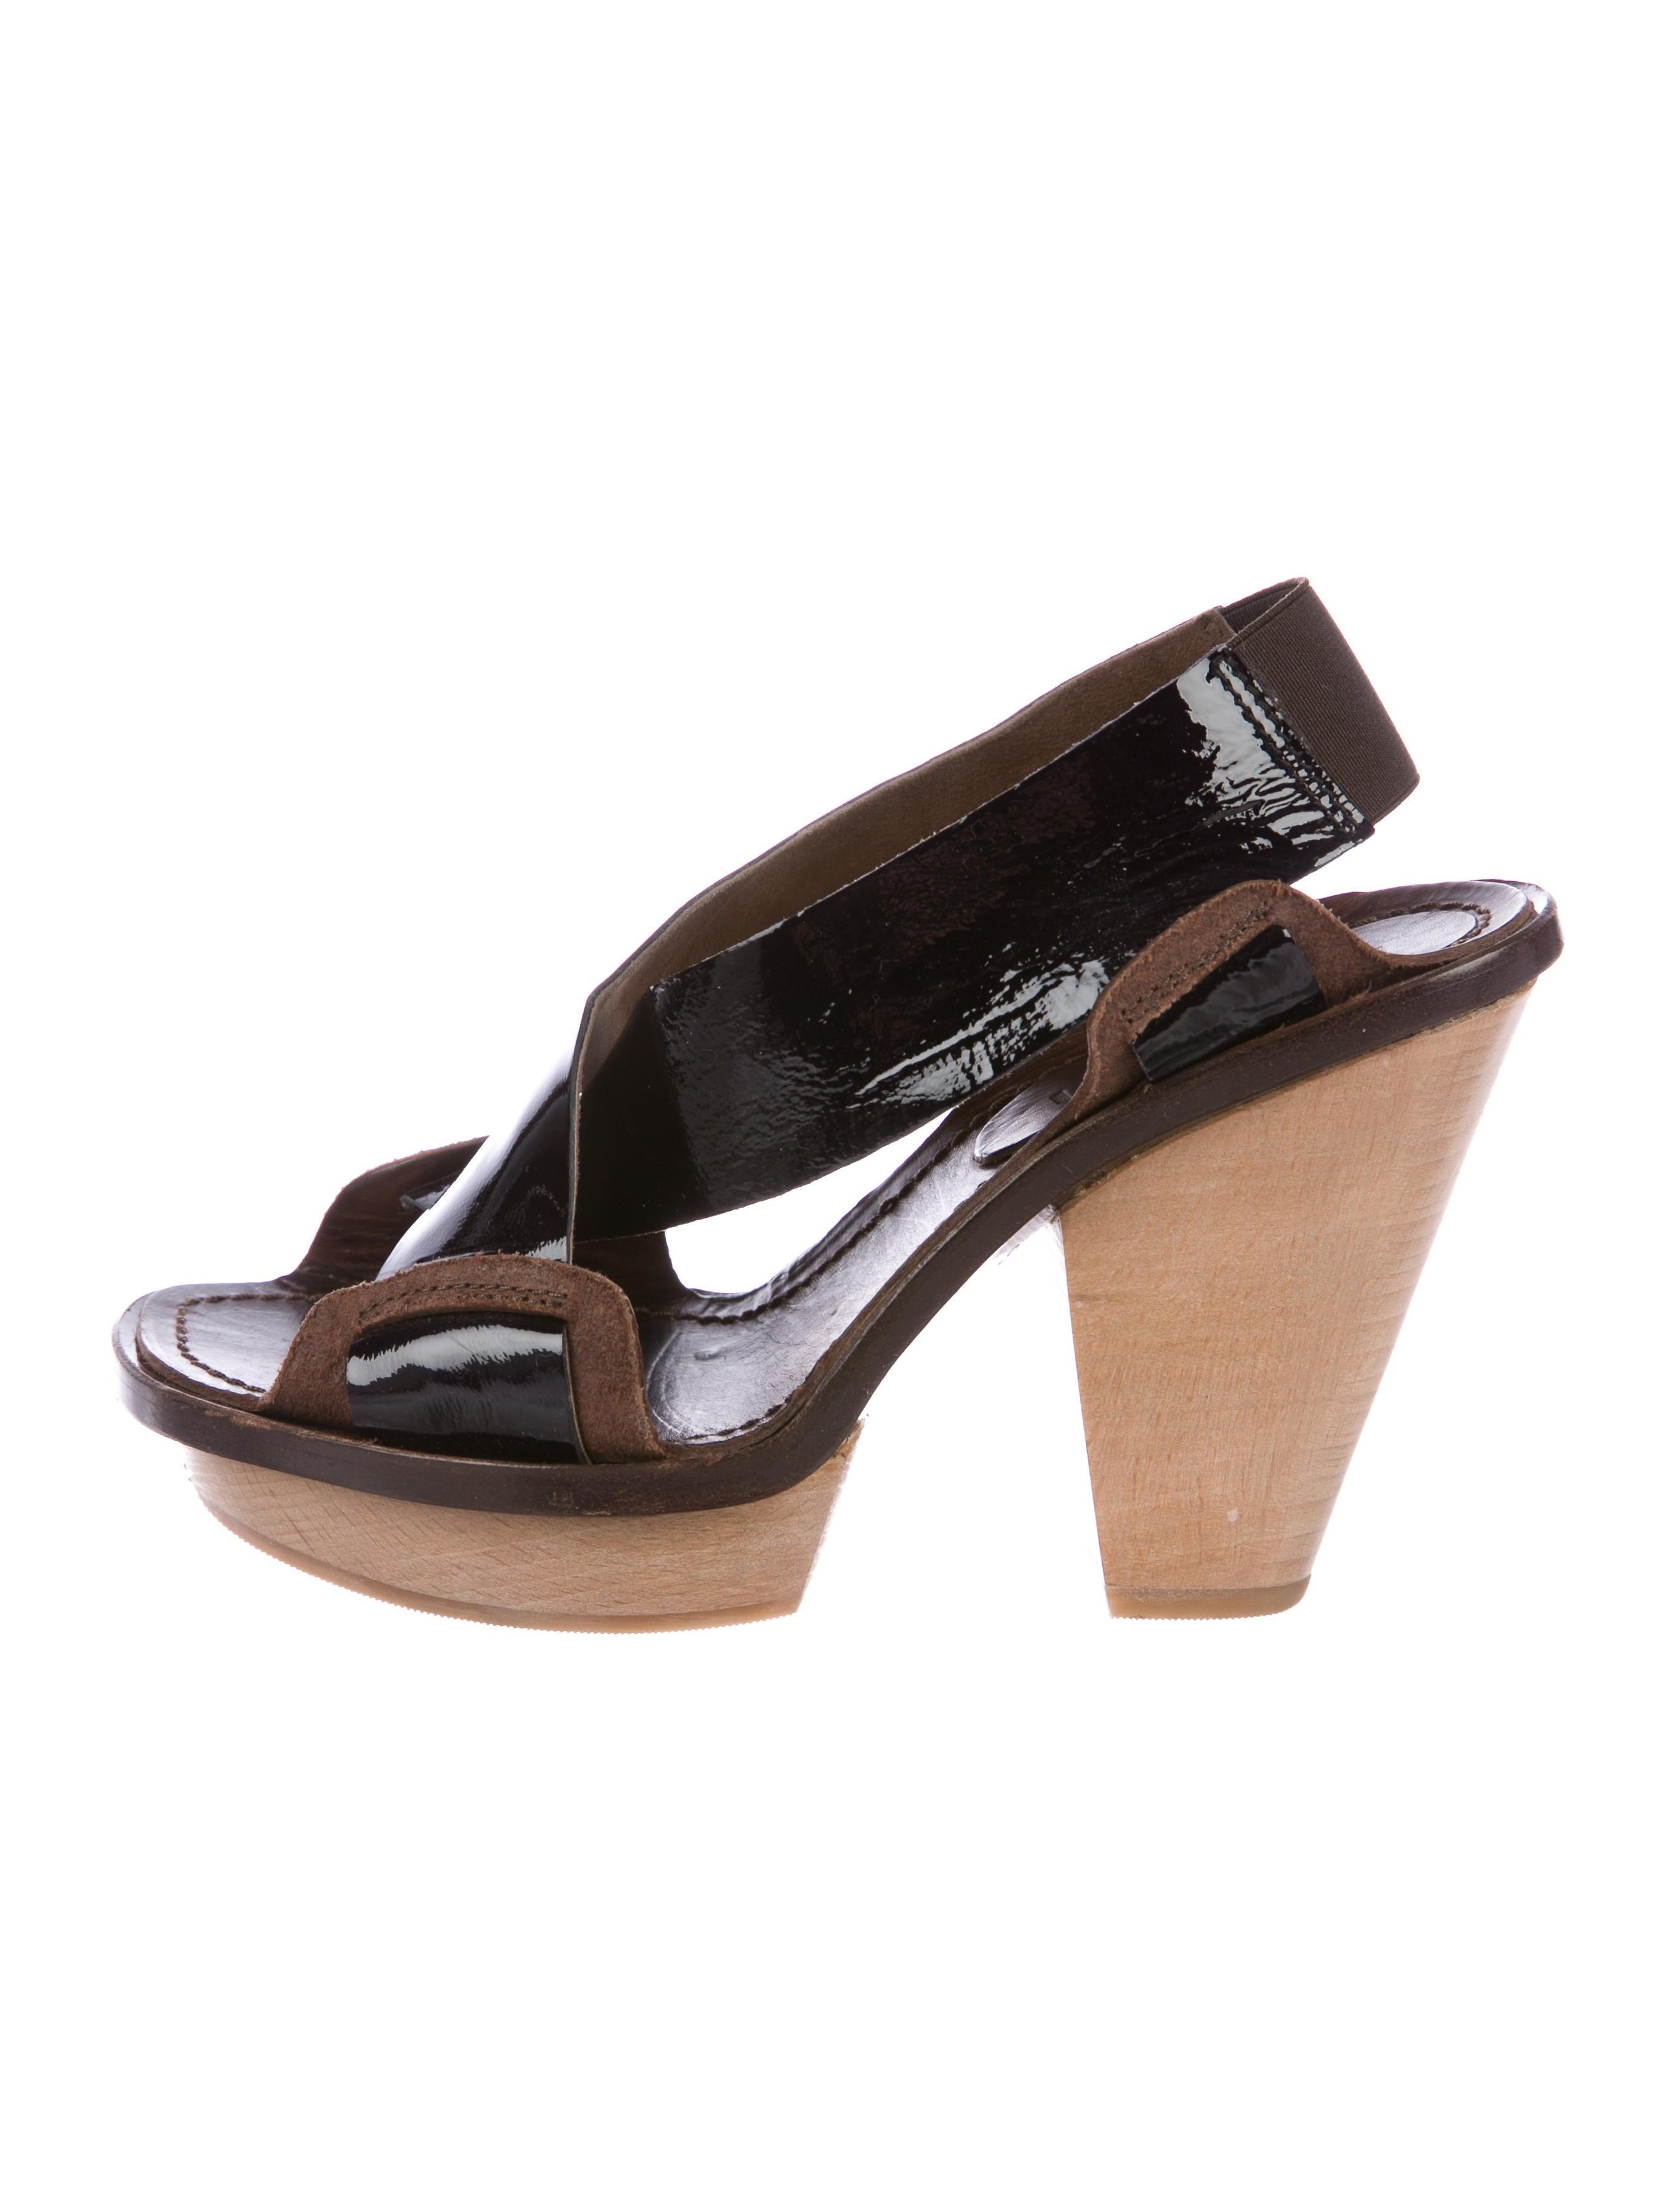 Marni Patent Leather Slingback Sandals sale L0SaNv2